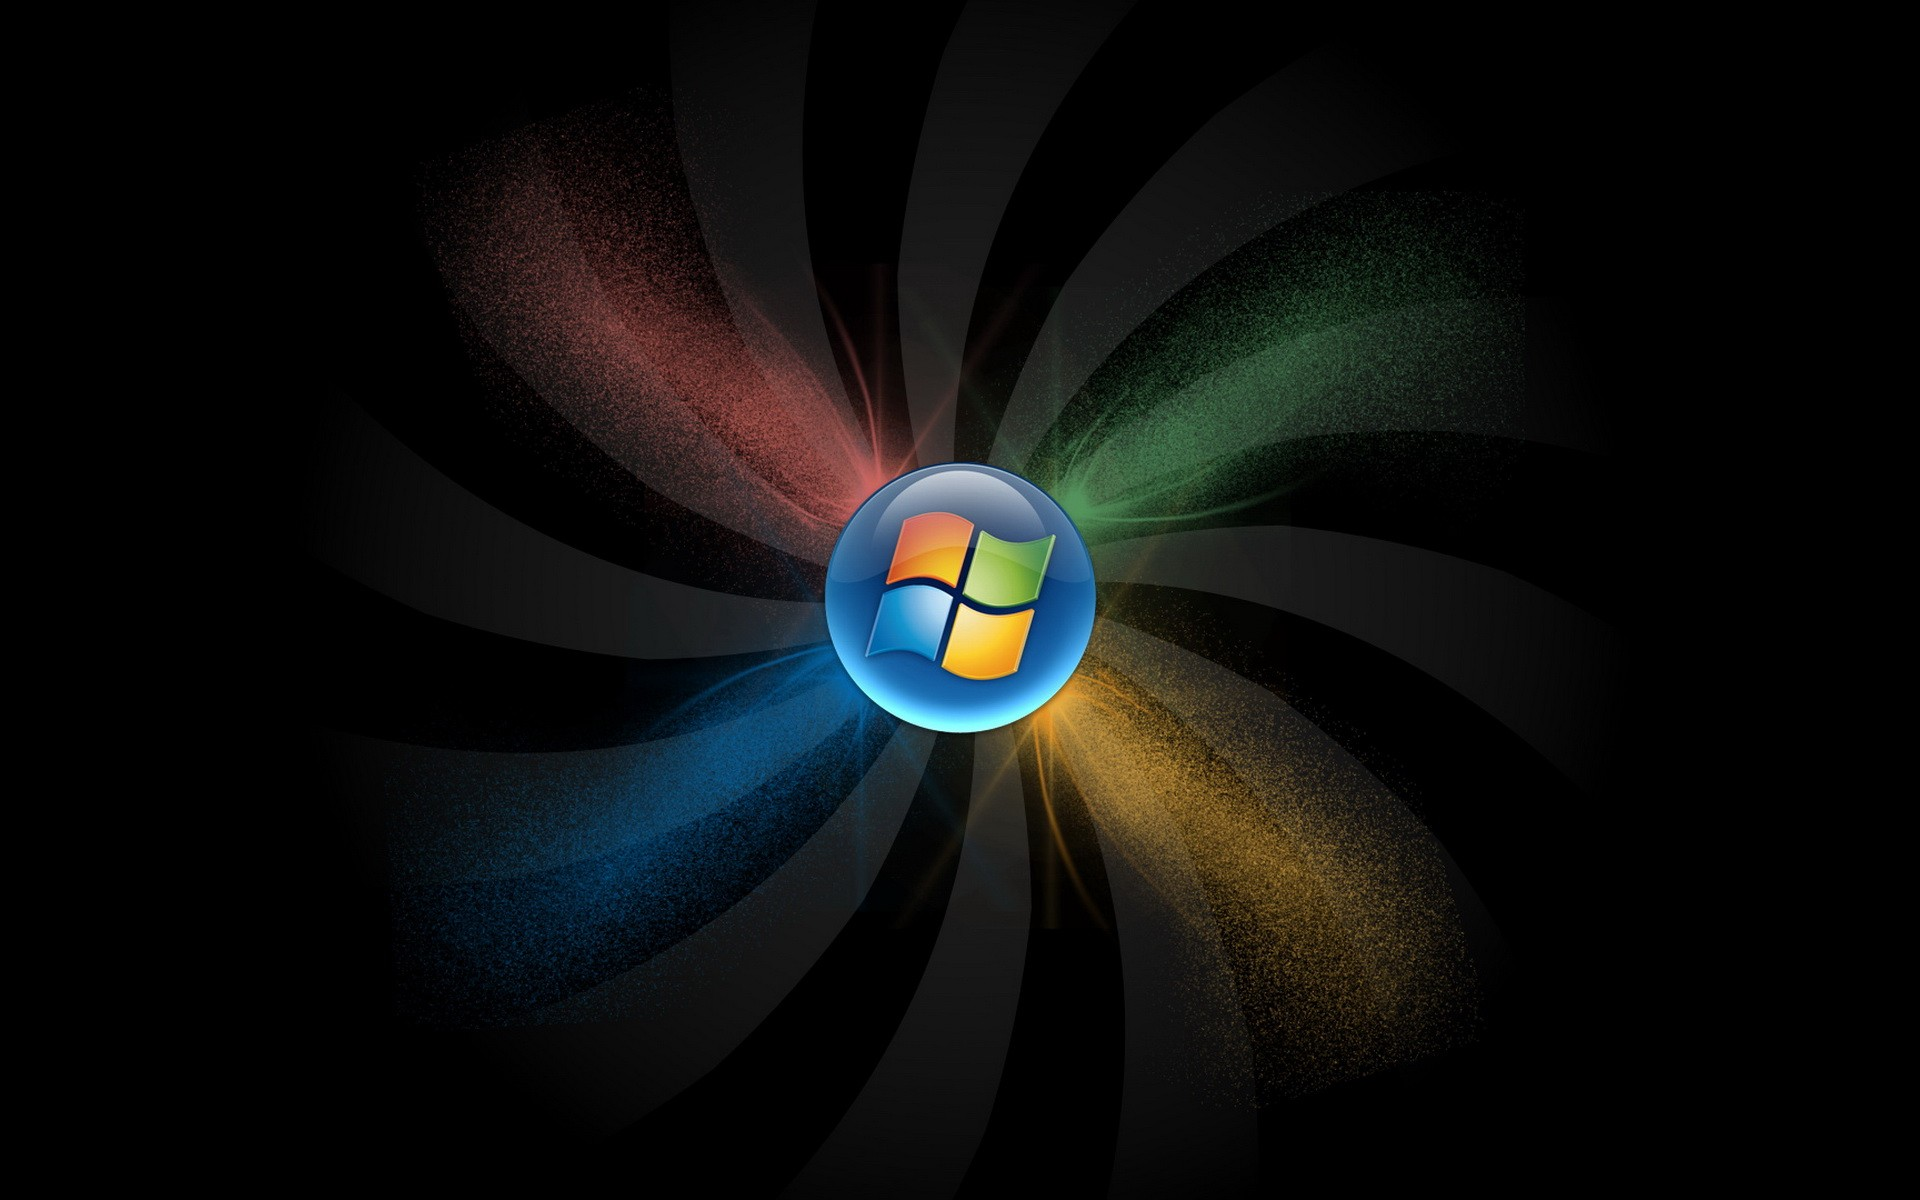 Microsoft Windows Wallpaper 1920x1200 Microsoft Windows 1920x1200